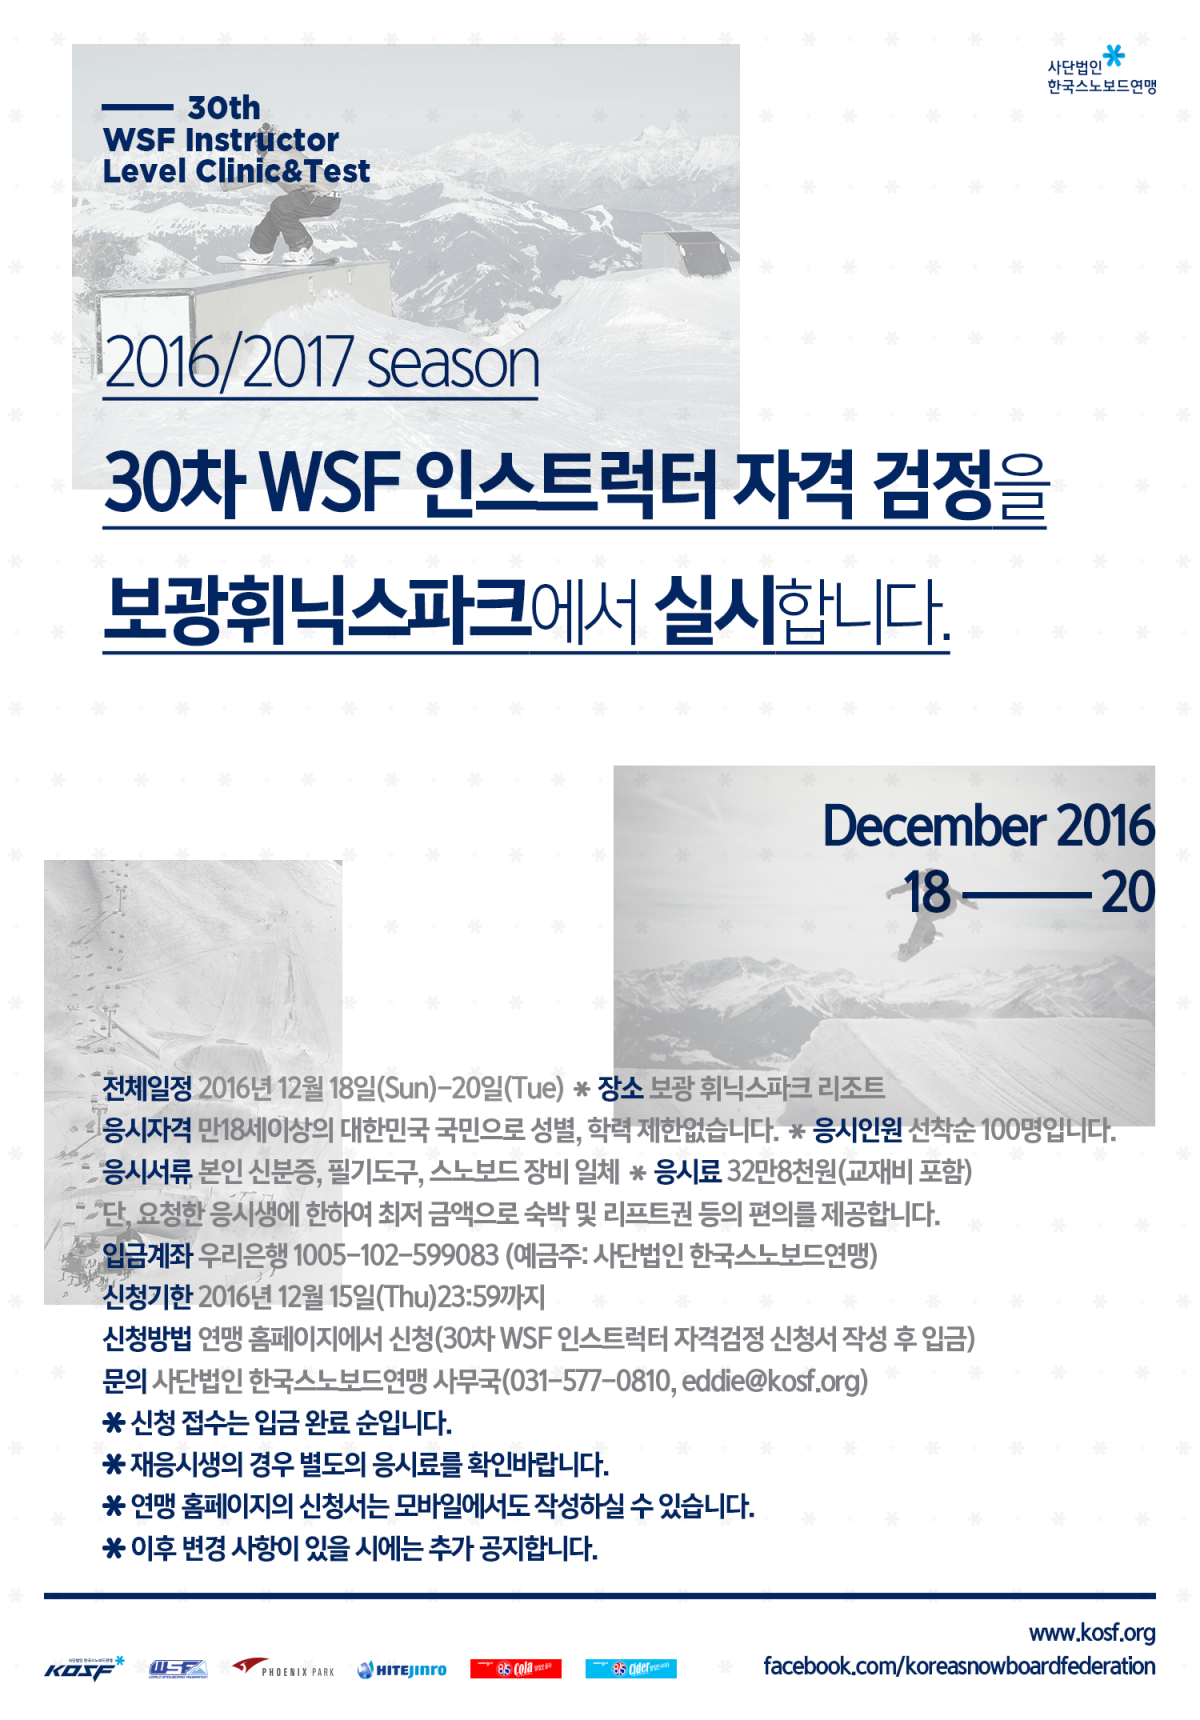 kosf_30thWSFinstructor_test20161117_011.png